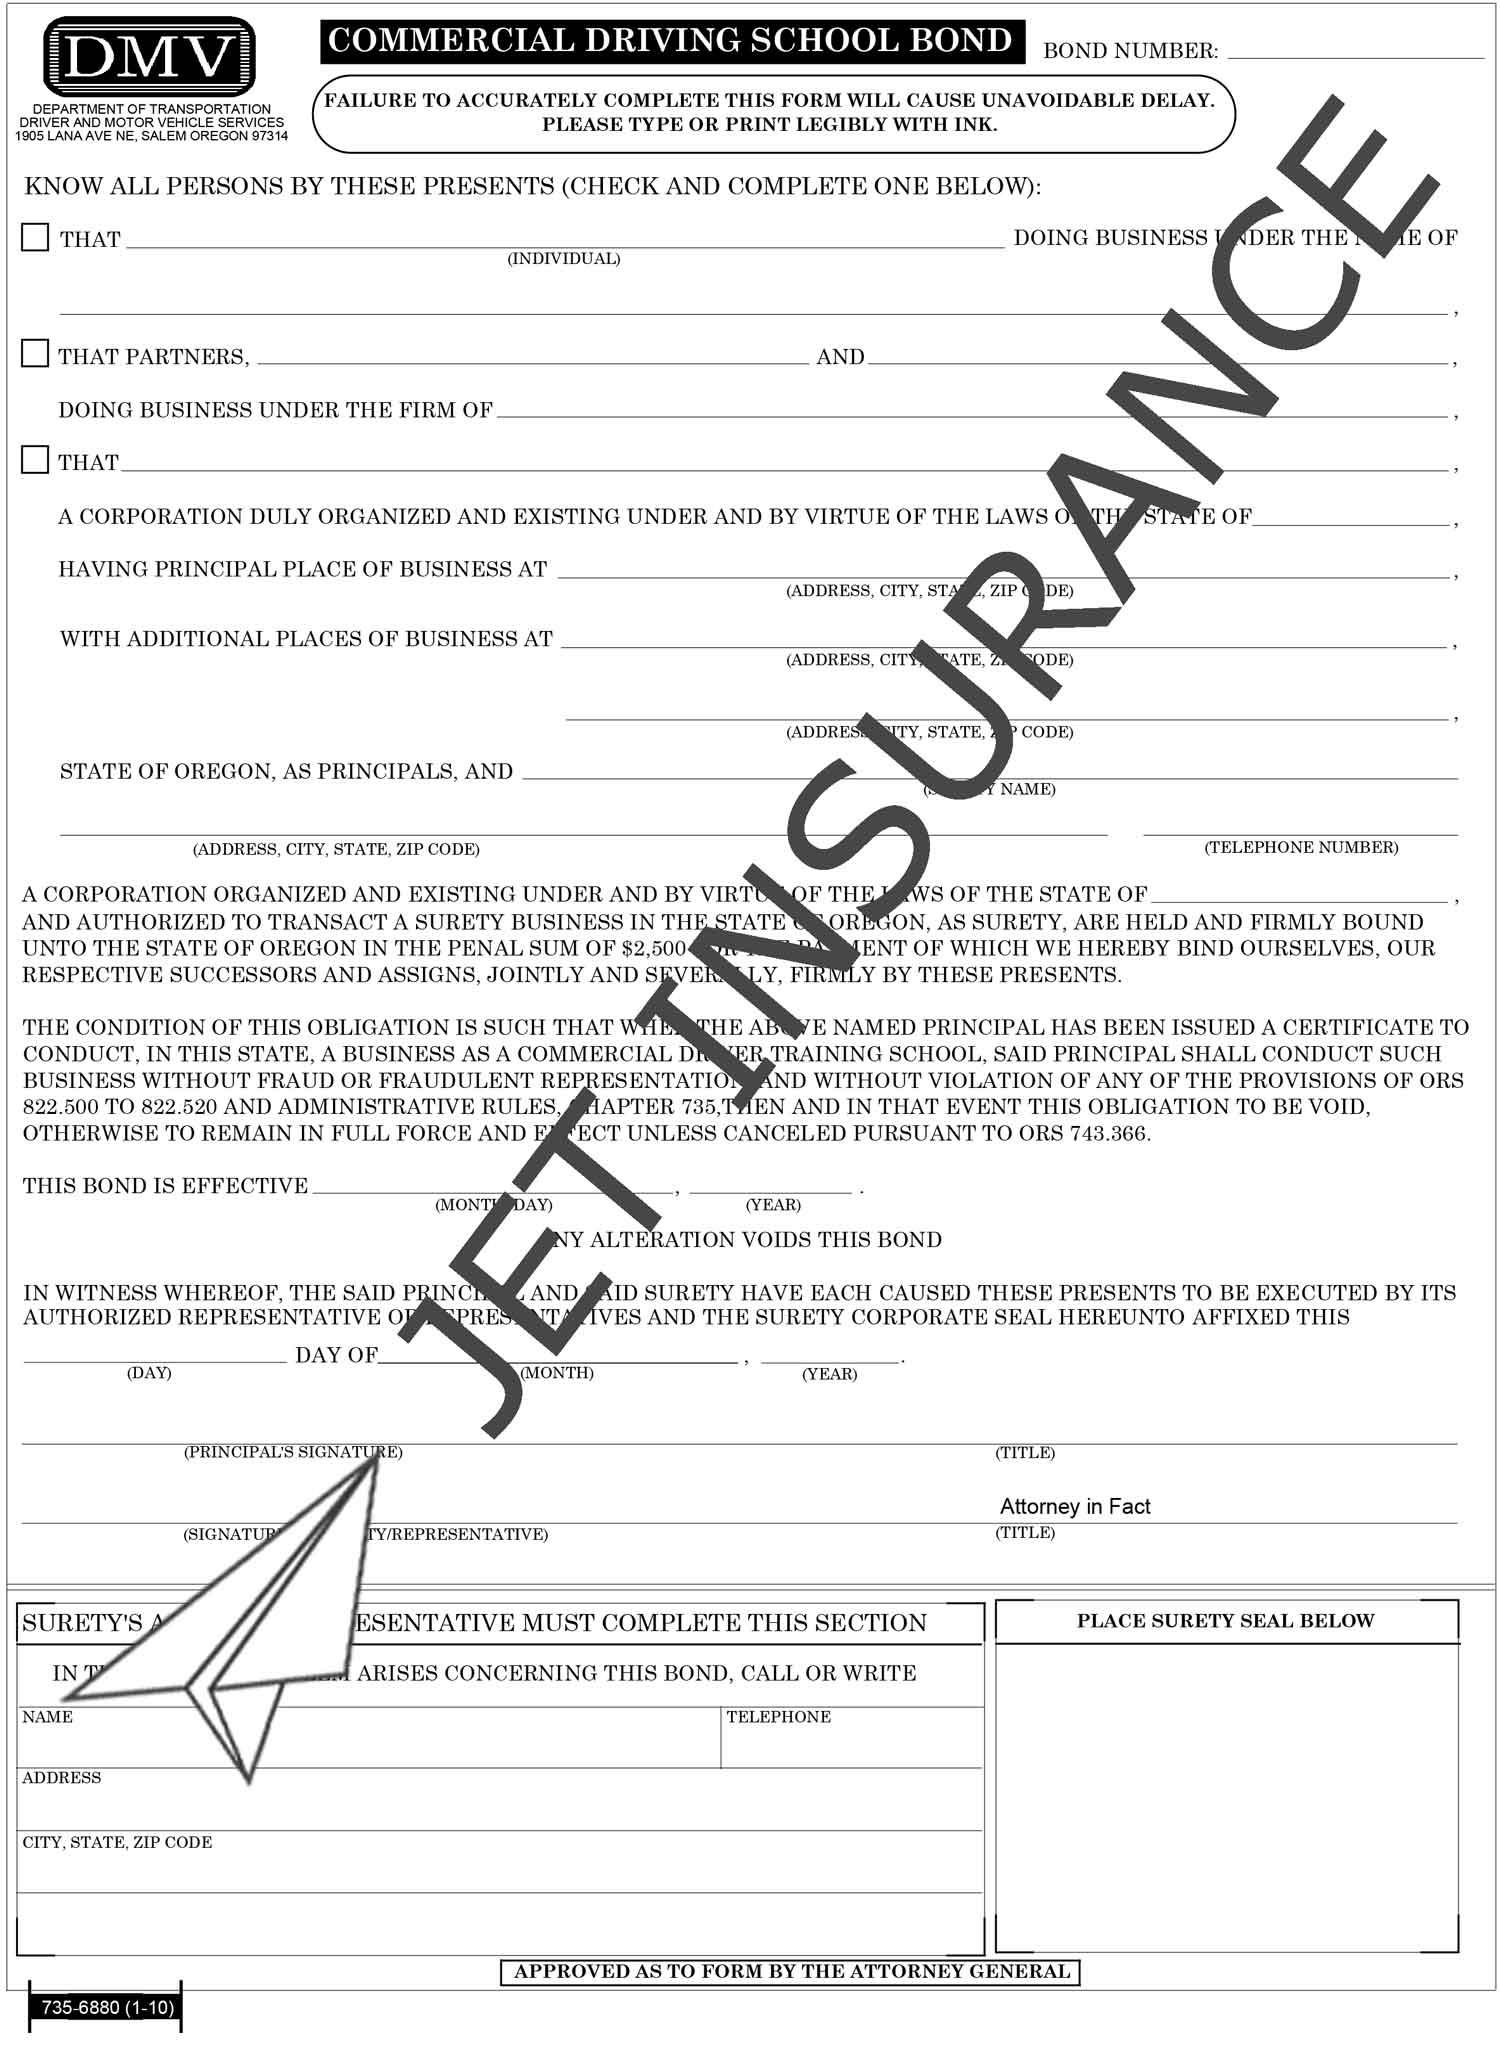 Oregon Commercial Driving School Bond Form